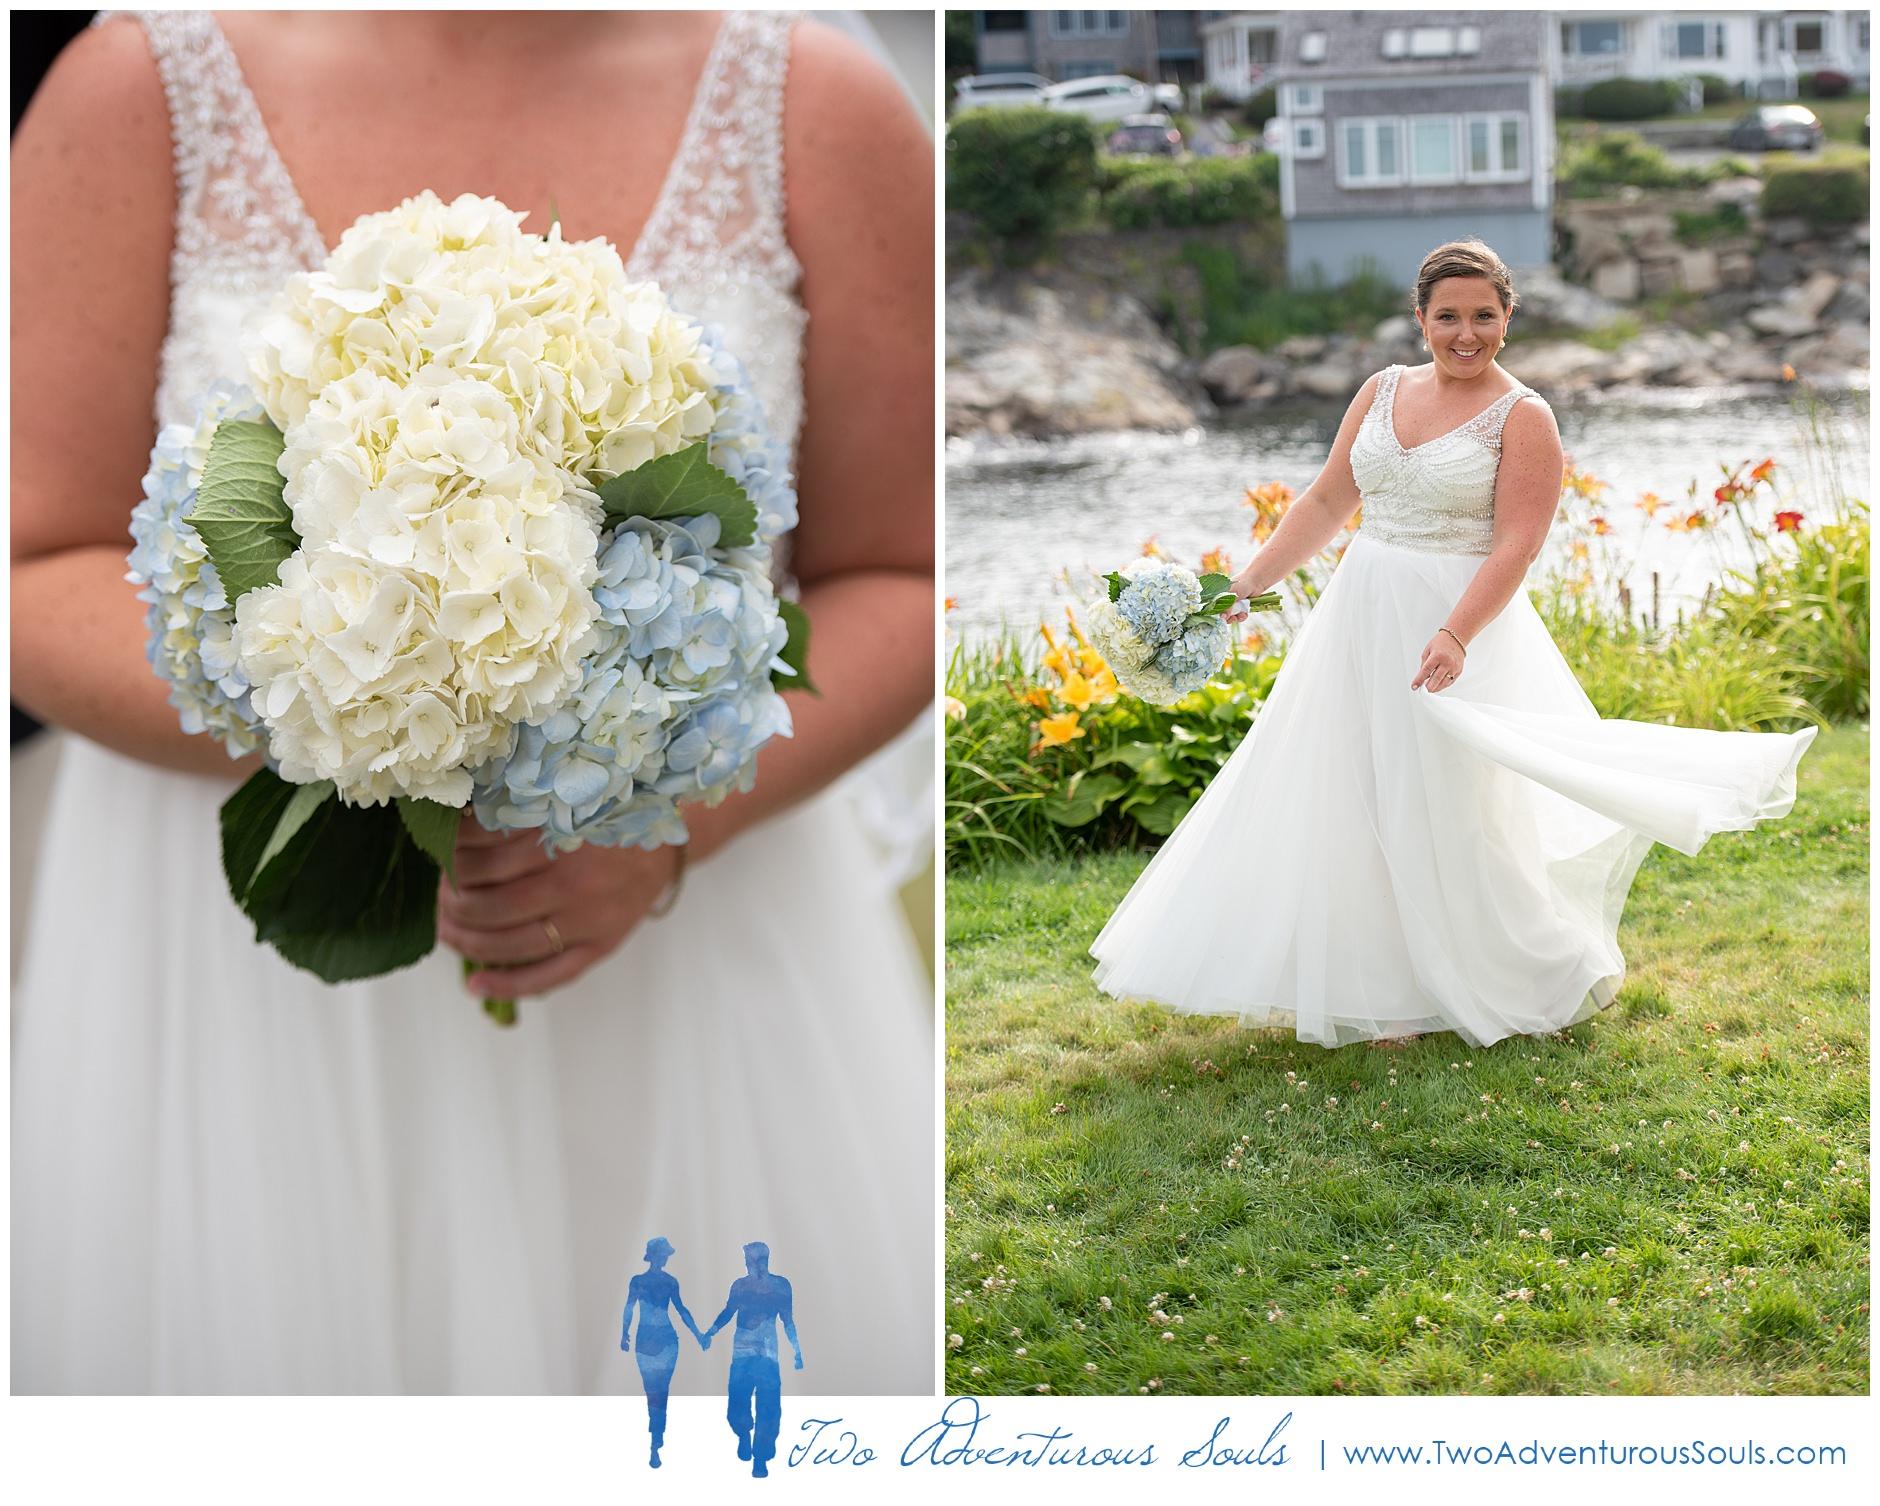 Maine Wedding Photographers, Ogunquit Wedding Photographers, Maine Elopement Photographers, Two Adventurous Souls-080619_0022.jpg